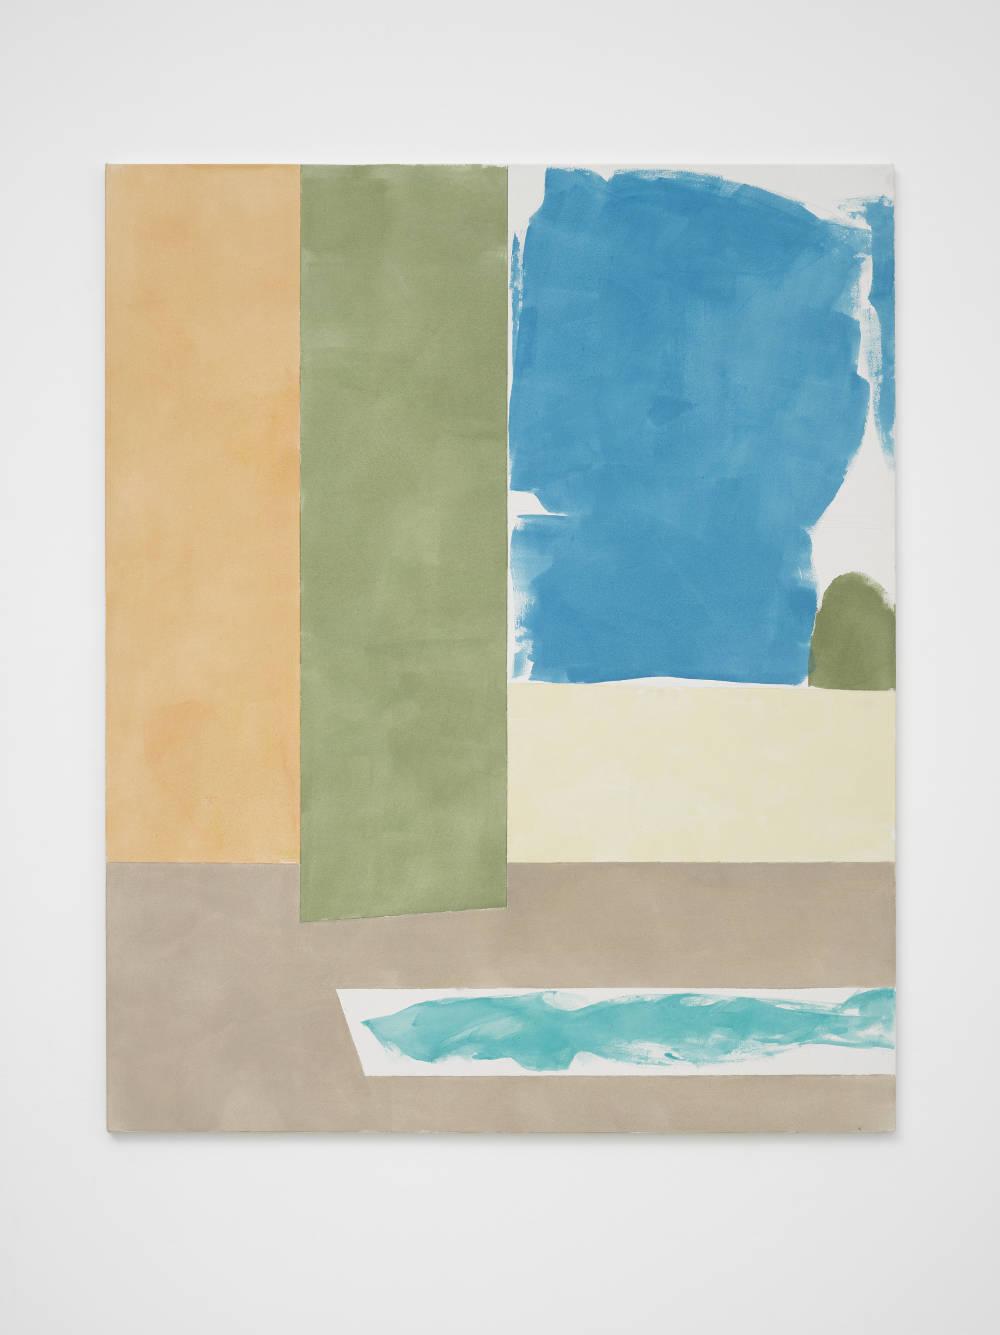 Peter Joseph, Light Orange, Green, Blue, Lemon, Mushroom, Turquoise, 2016. 54 x 44 inches (137.2 x 111.8 cm) © Peter Joseph; Courtesy Lisson Gallery. Photo by Jack Hems